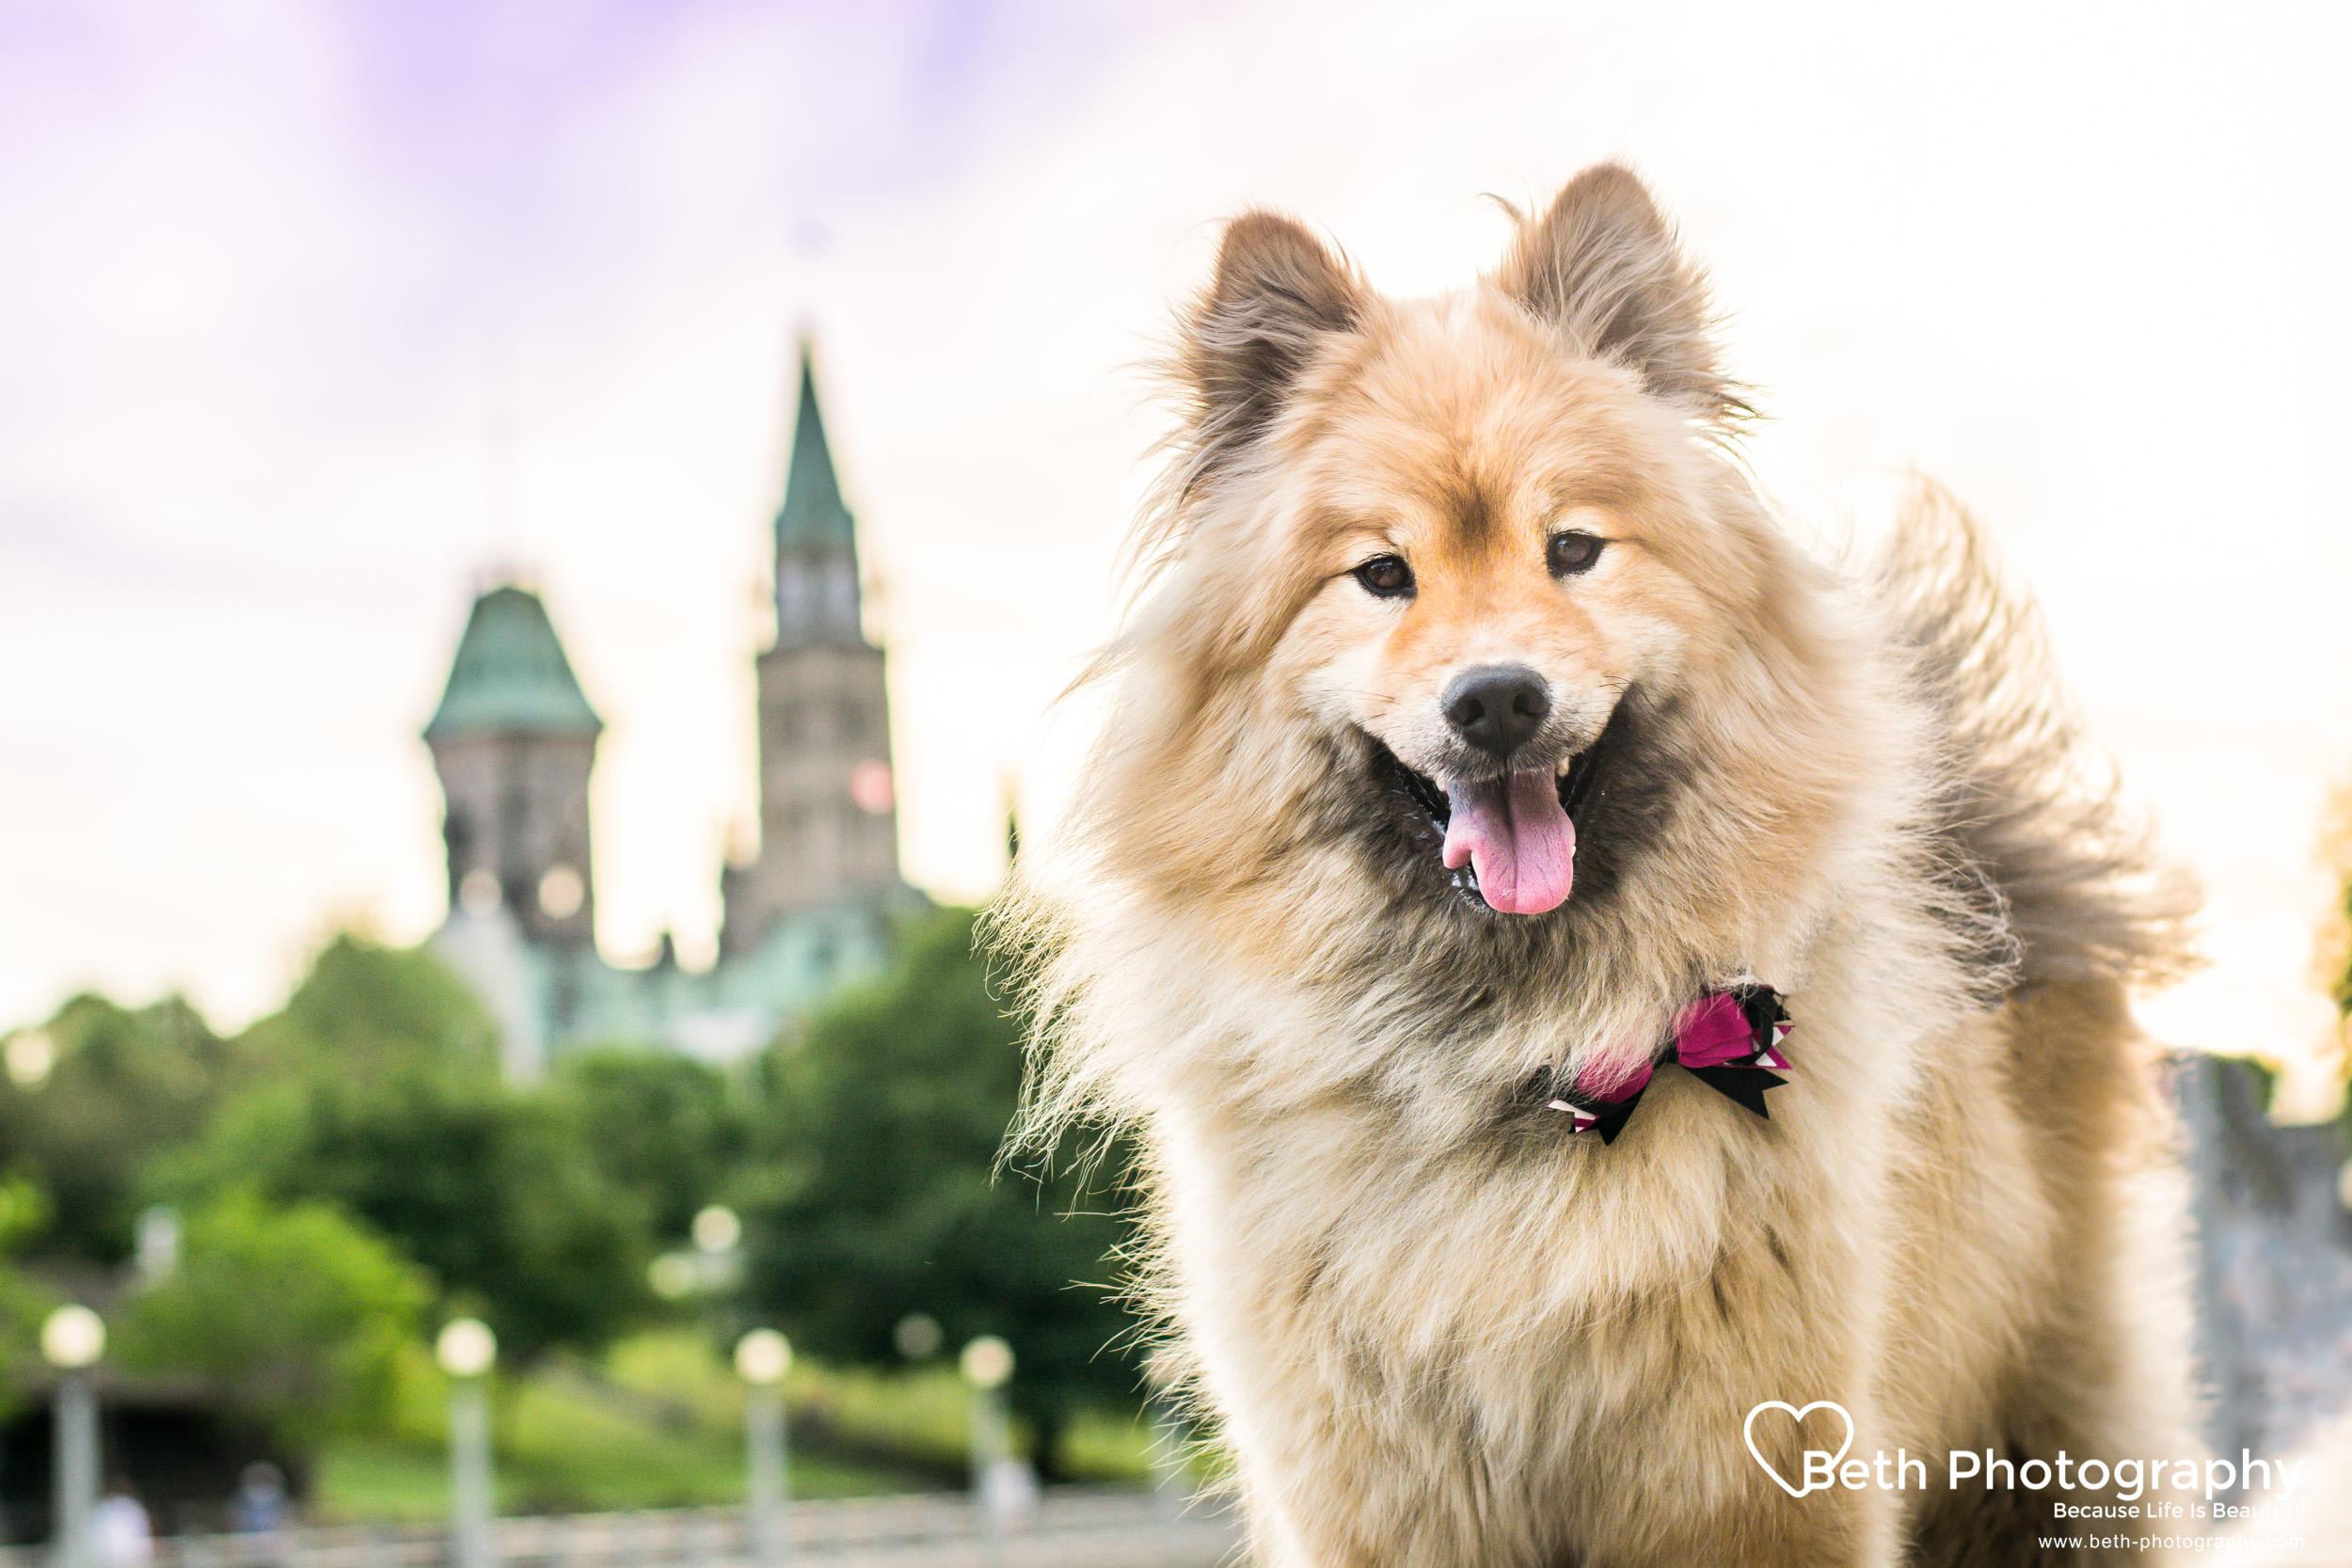 Beth Photography- Pet photographer - Ottawa to Cornwall.jpg